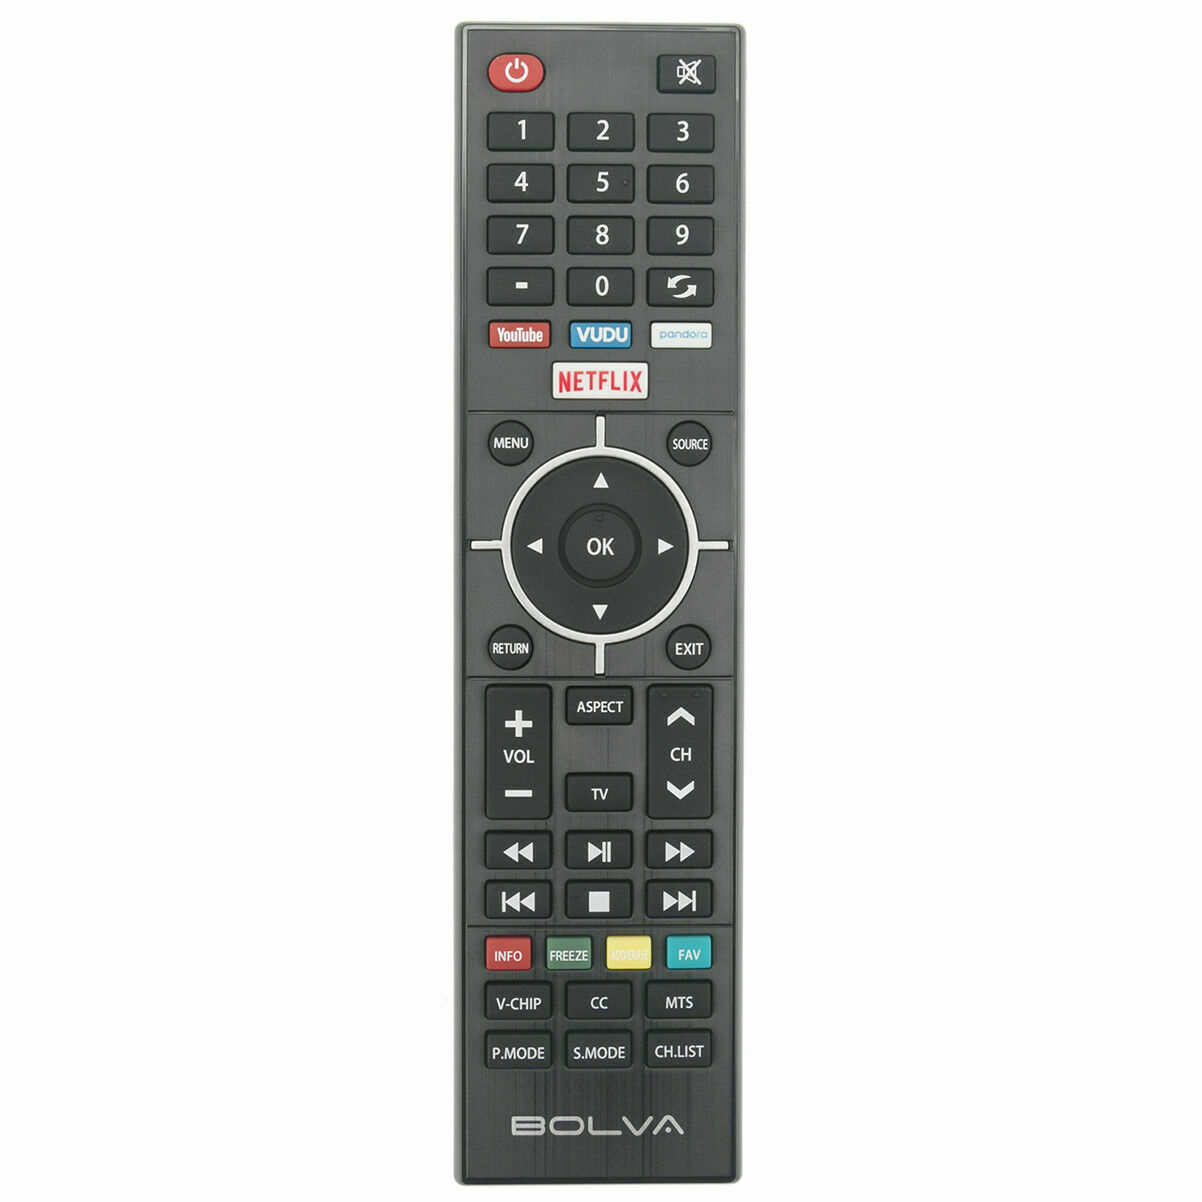 Genuine BOLVA 4K LED UHD smart TV remote Control for Most Bolva TVs